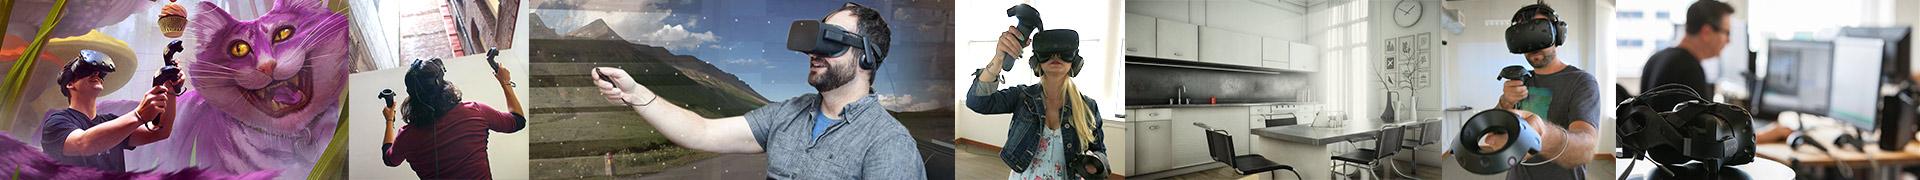 Portland Virtual Reality Development